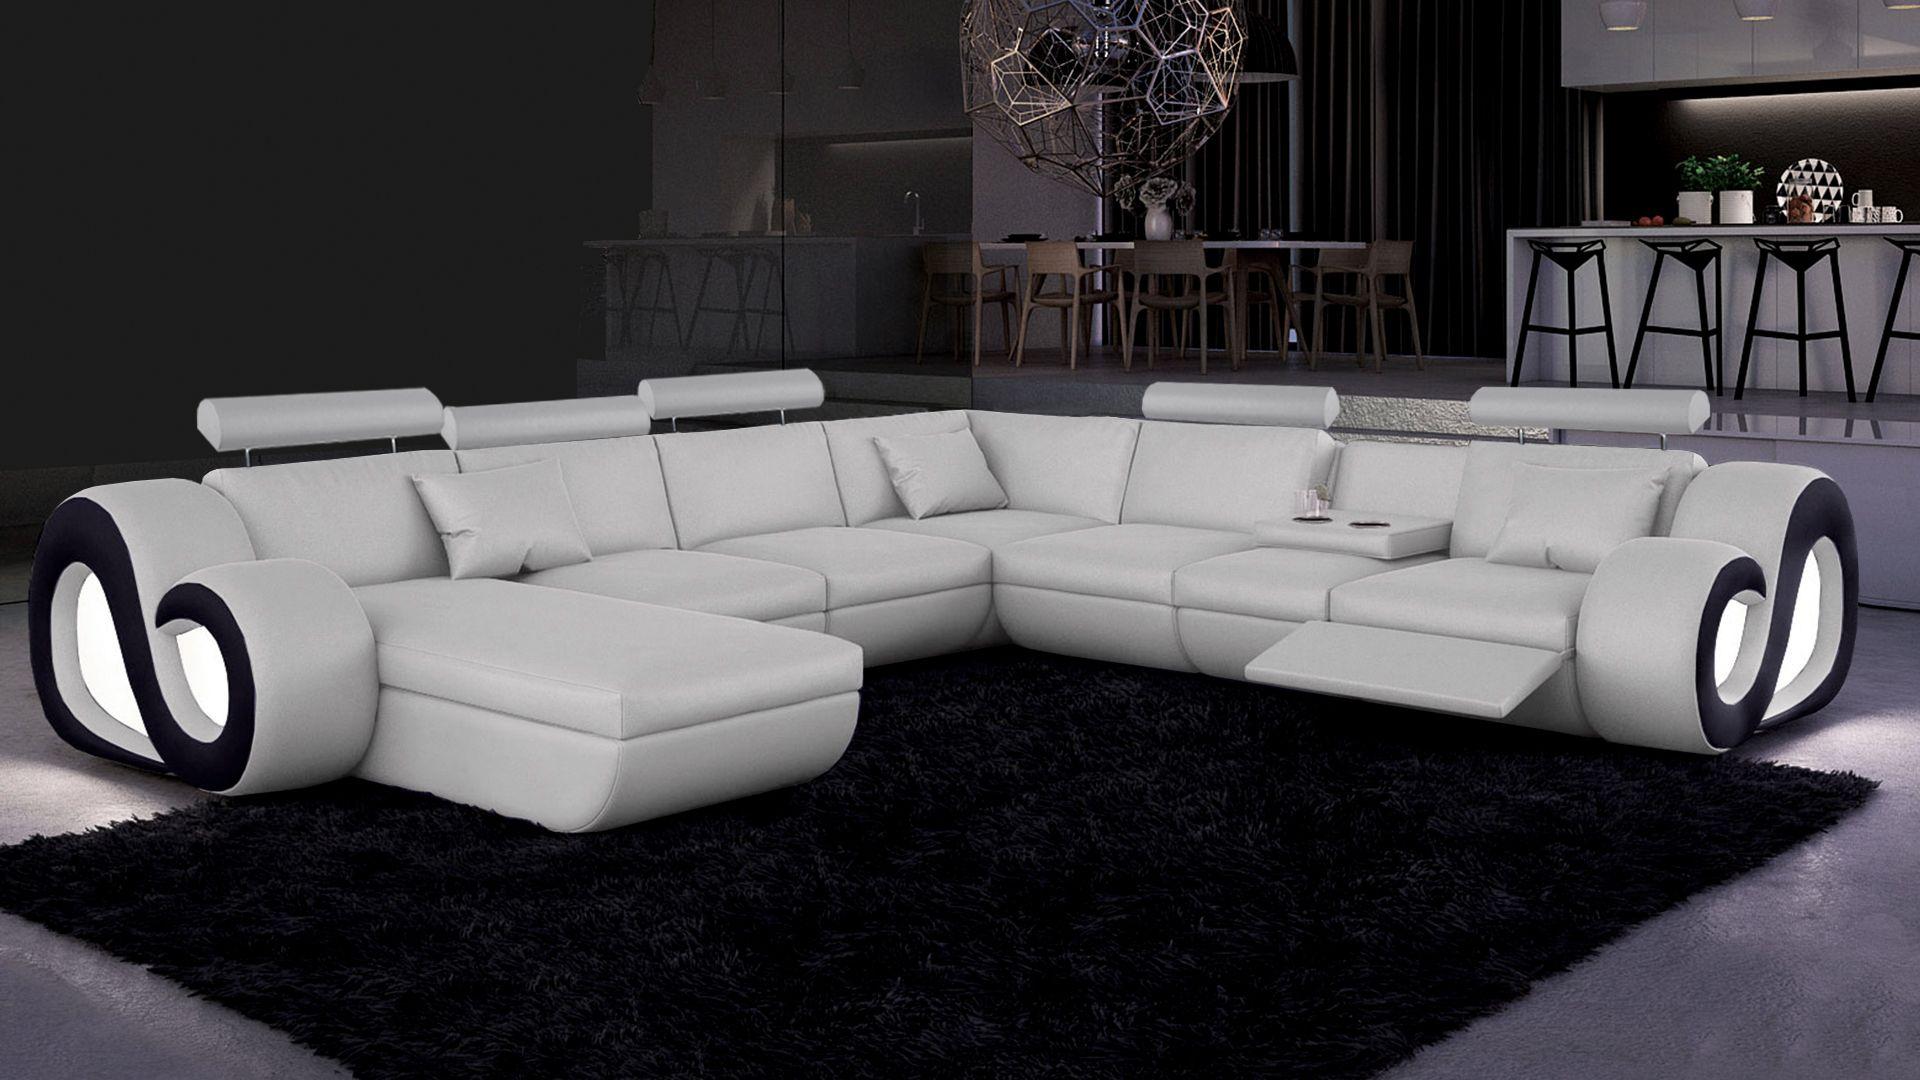 Amazon Canapé Convertible Inspirant Galerie Canapé Simili Cuir Marron Centralillaw